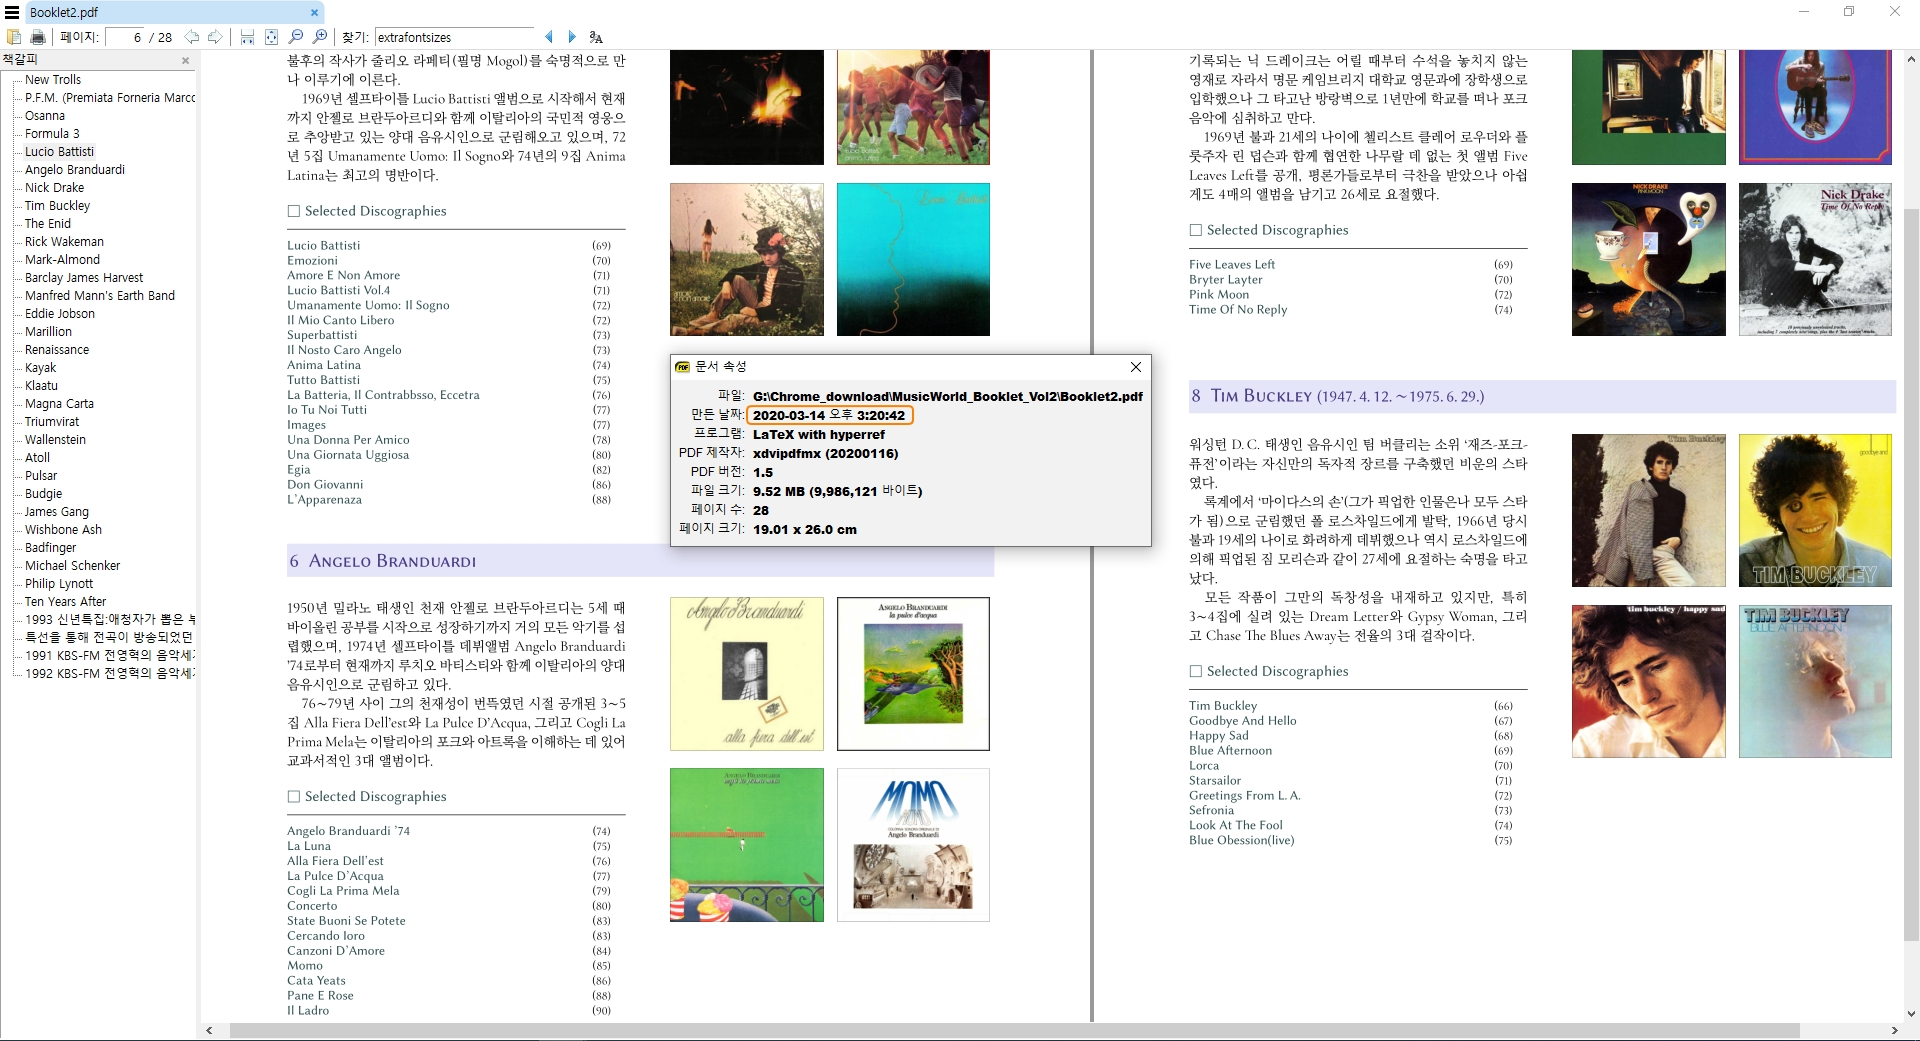 MusicWorld_booklet_vol2.jpg